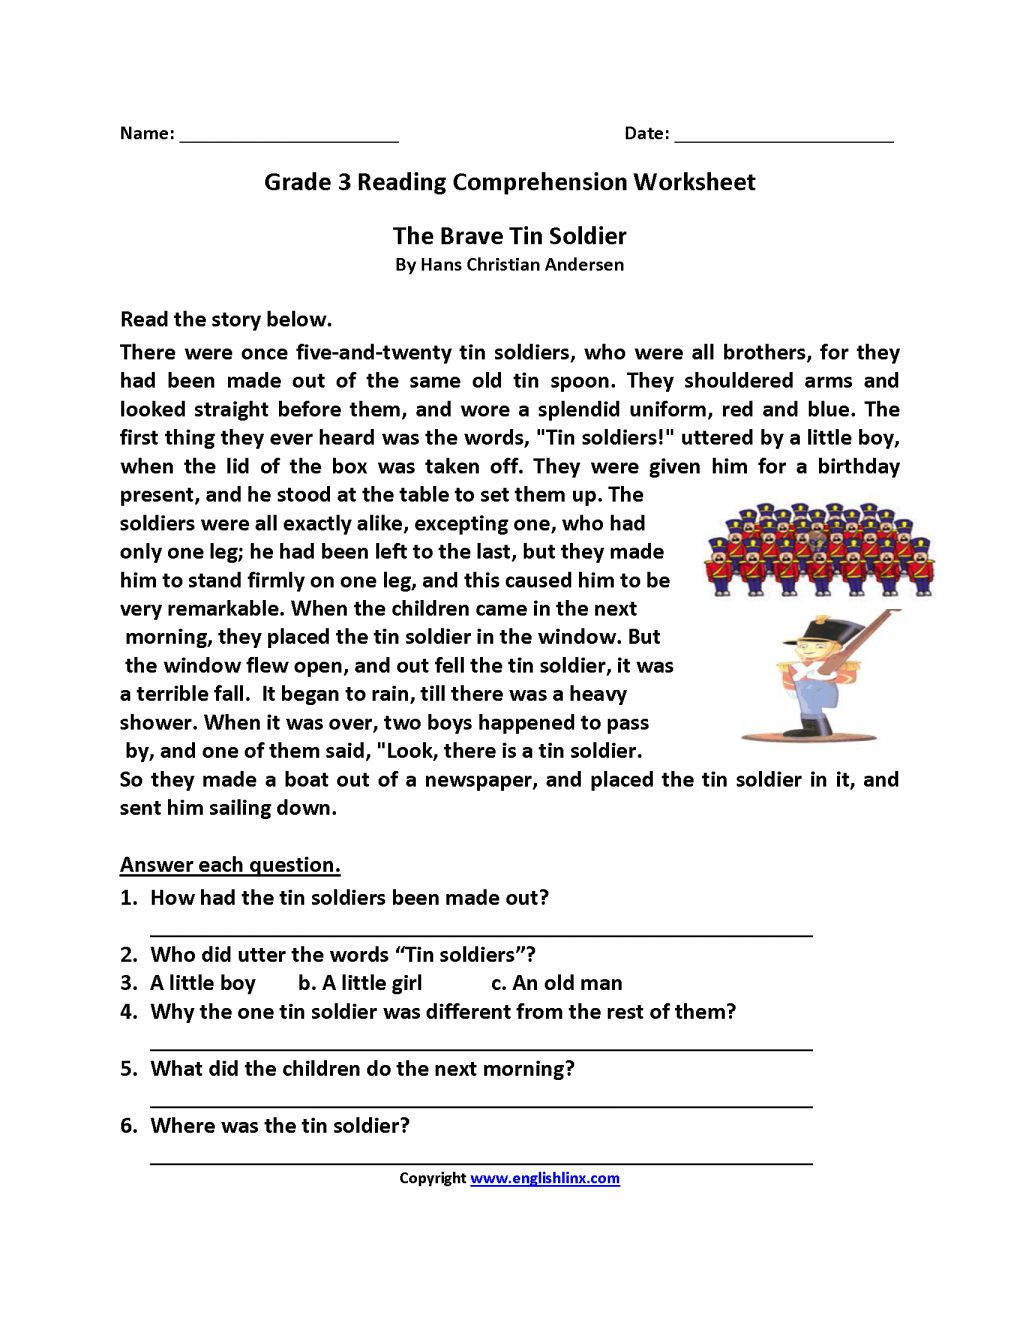 hight resolution of 8+ 3Rd Grade Reading Activities Worksheets - -  #3rdgradereadingactivitiesworksheets Check more at https://chartsheet.net/8 -3rd-grade-r…   Comprehension worksheets